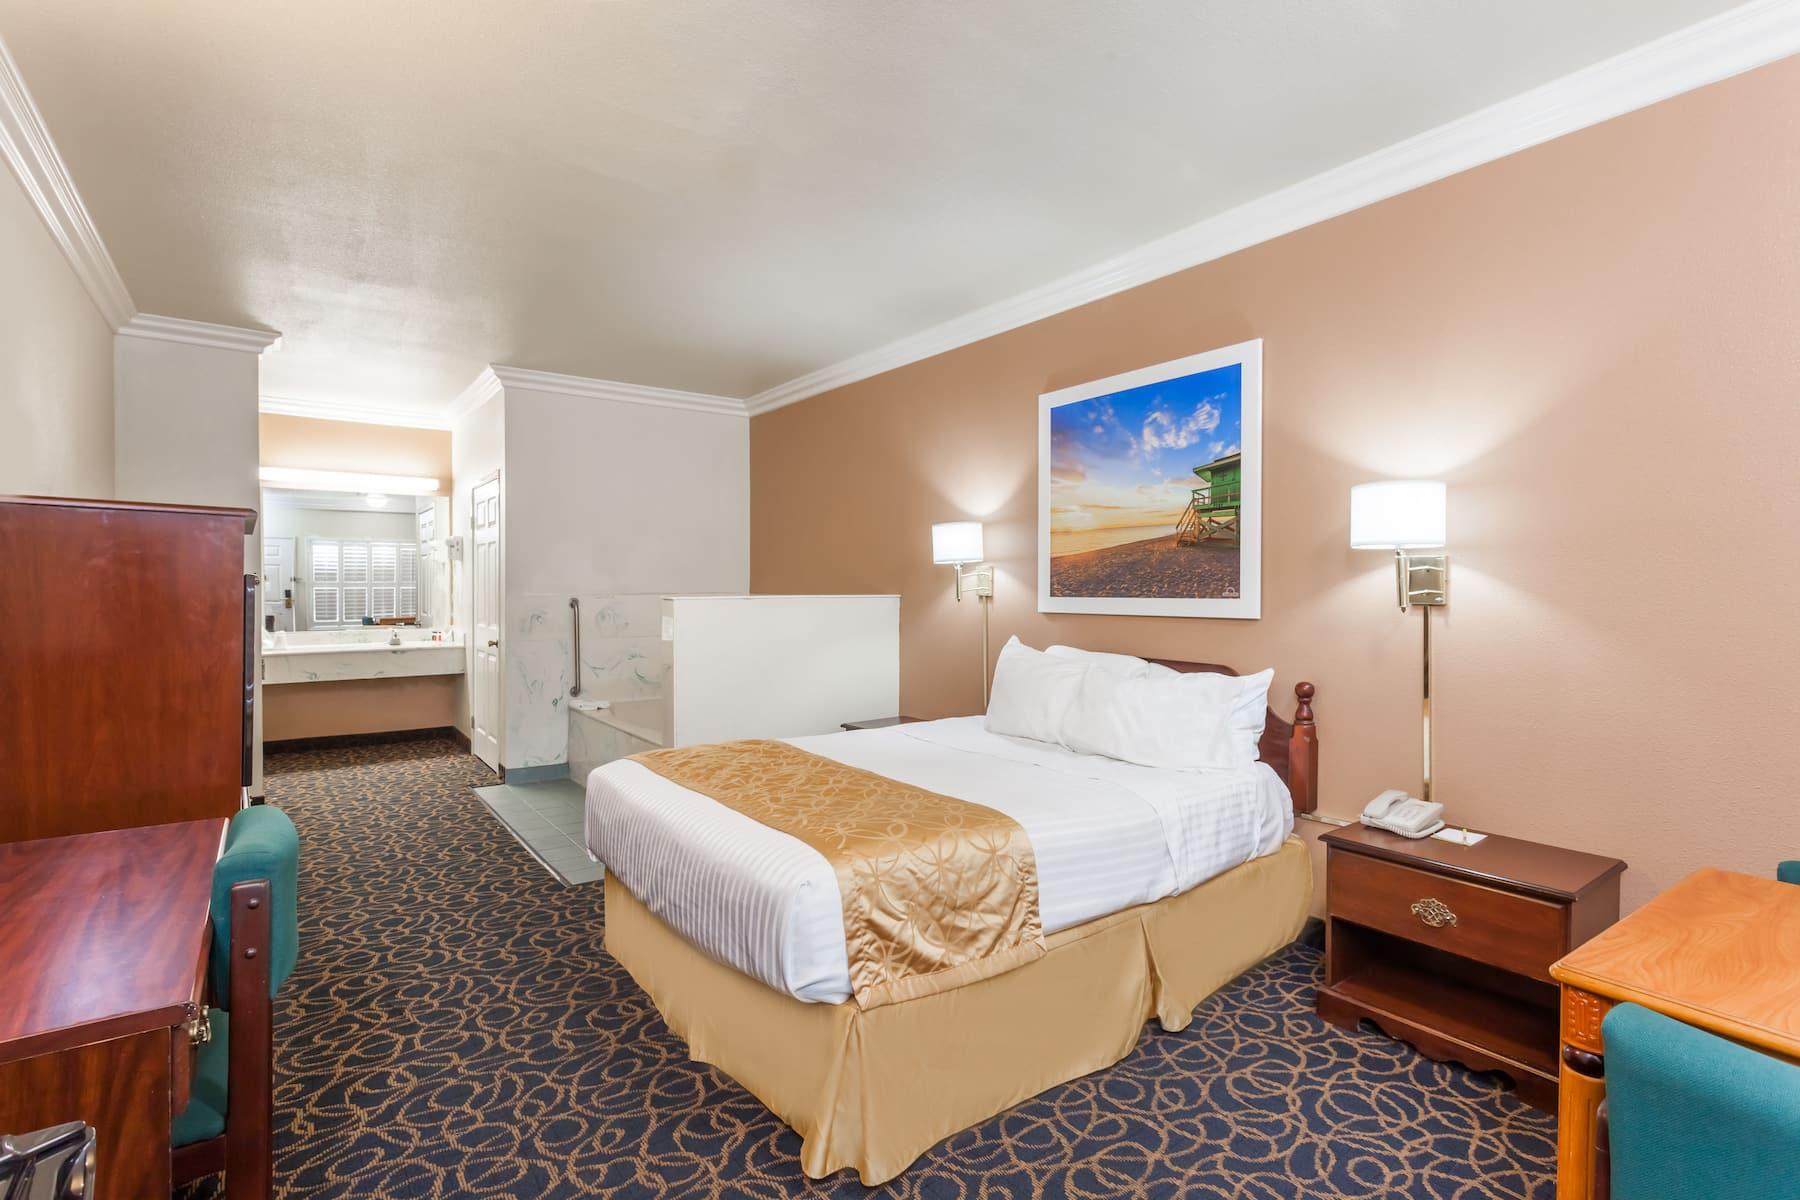 Days Inn Amp Suites By Wyndham South Gate South Gate Ca